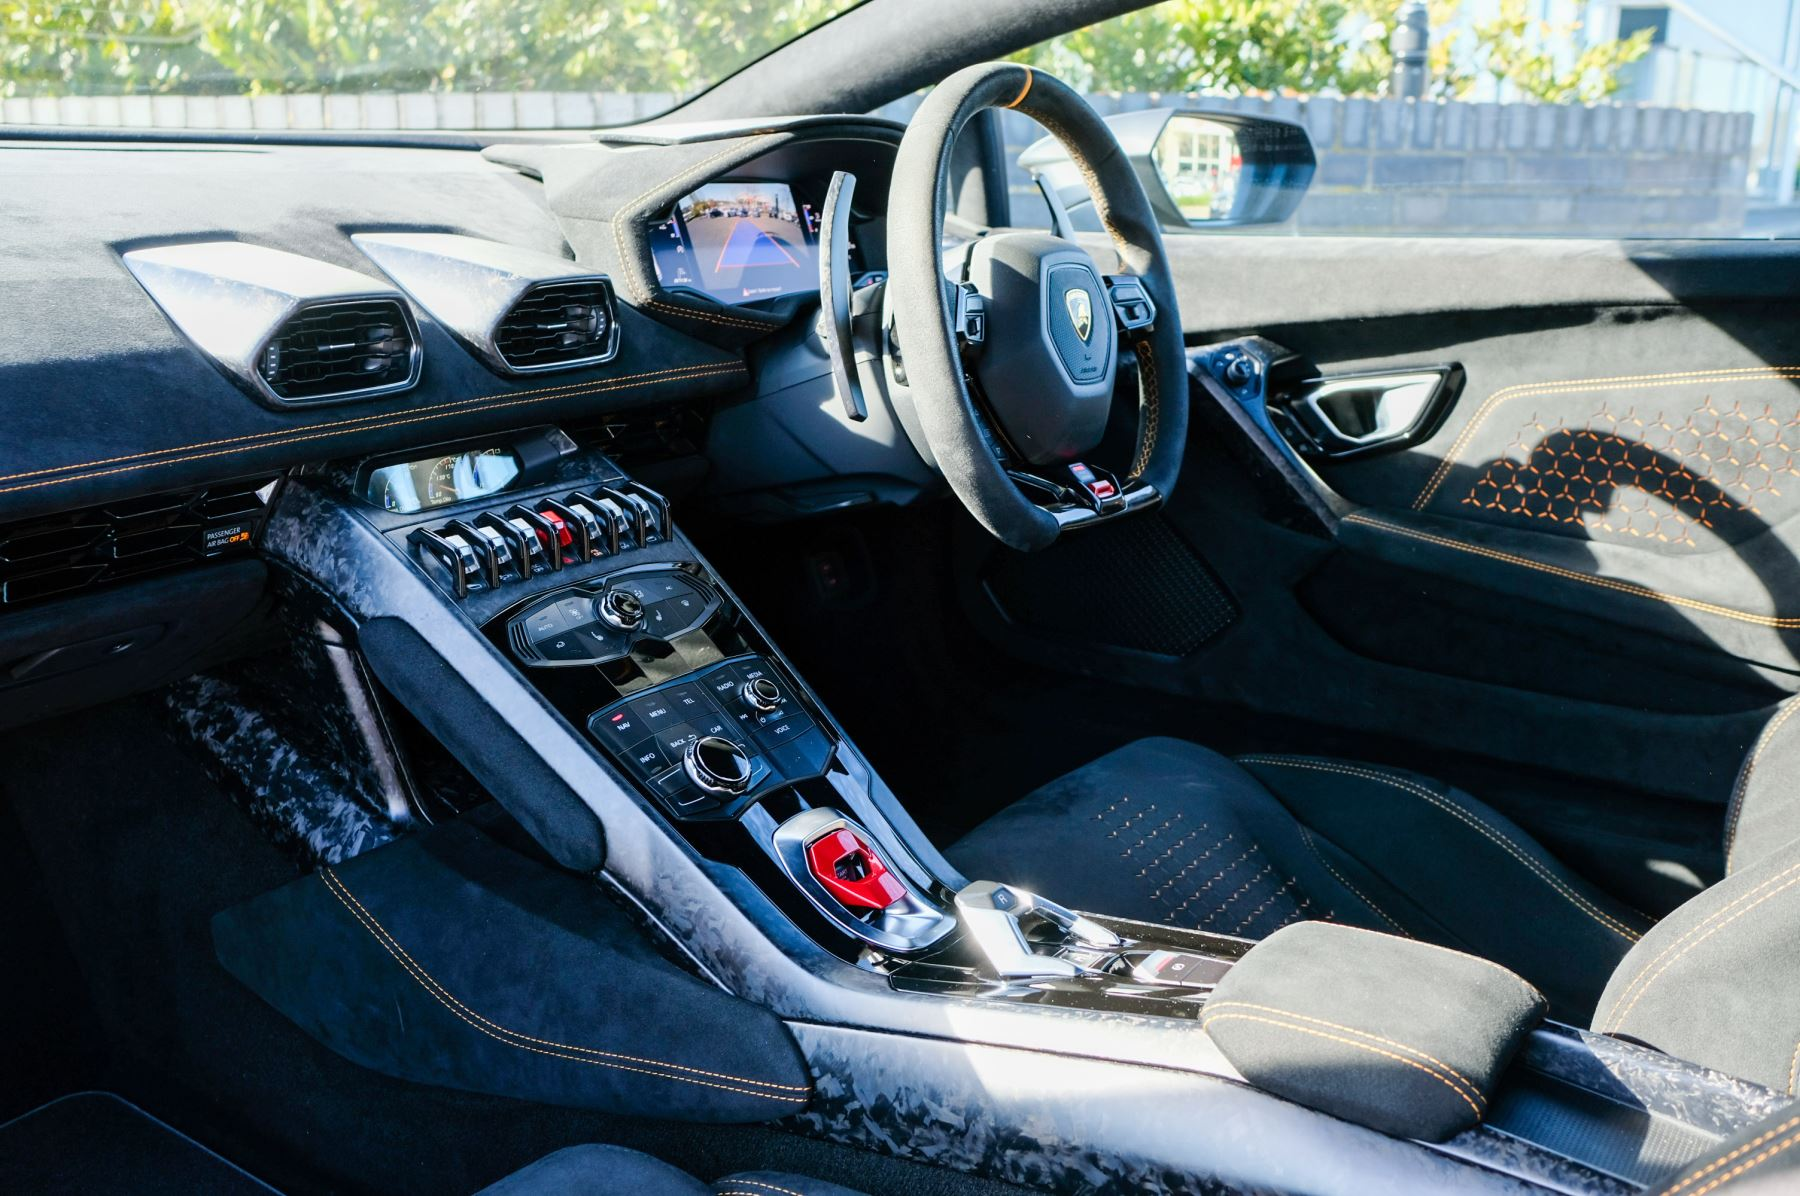 Lamborghini Huracan Performante LP 640-4 2dr LDF - Carbon Ceramic Brakes - Carbon Fiber Features - Comfort Seats image 7